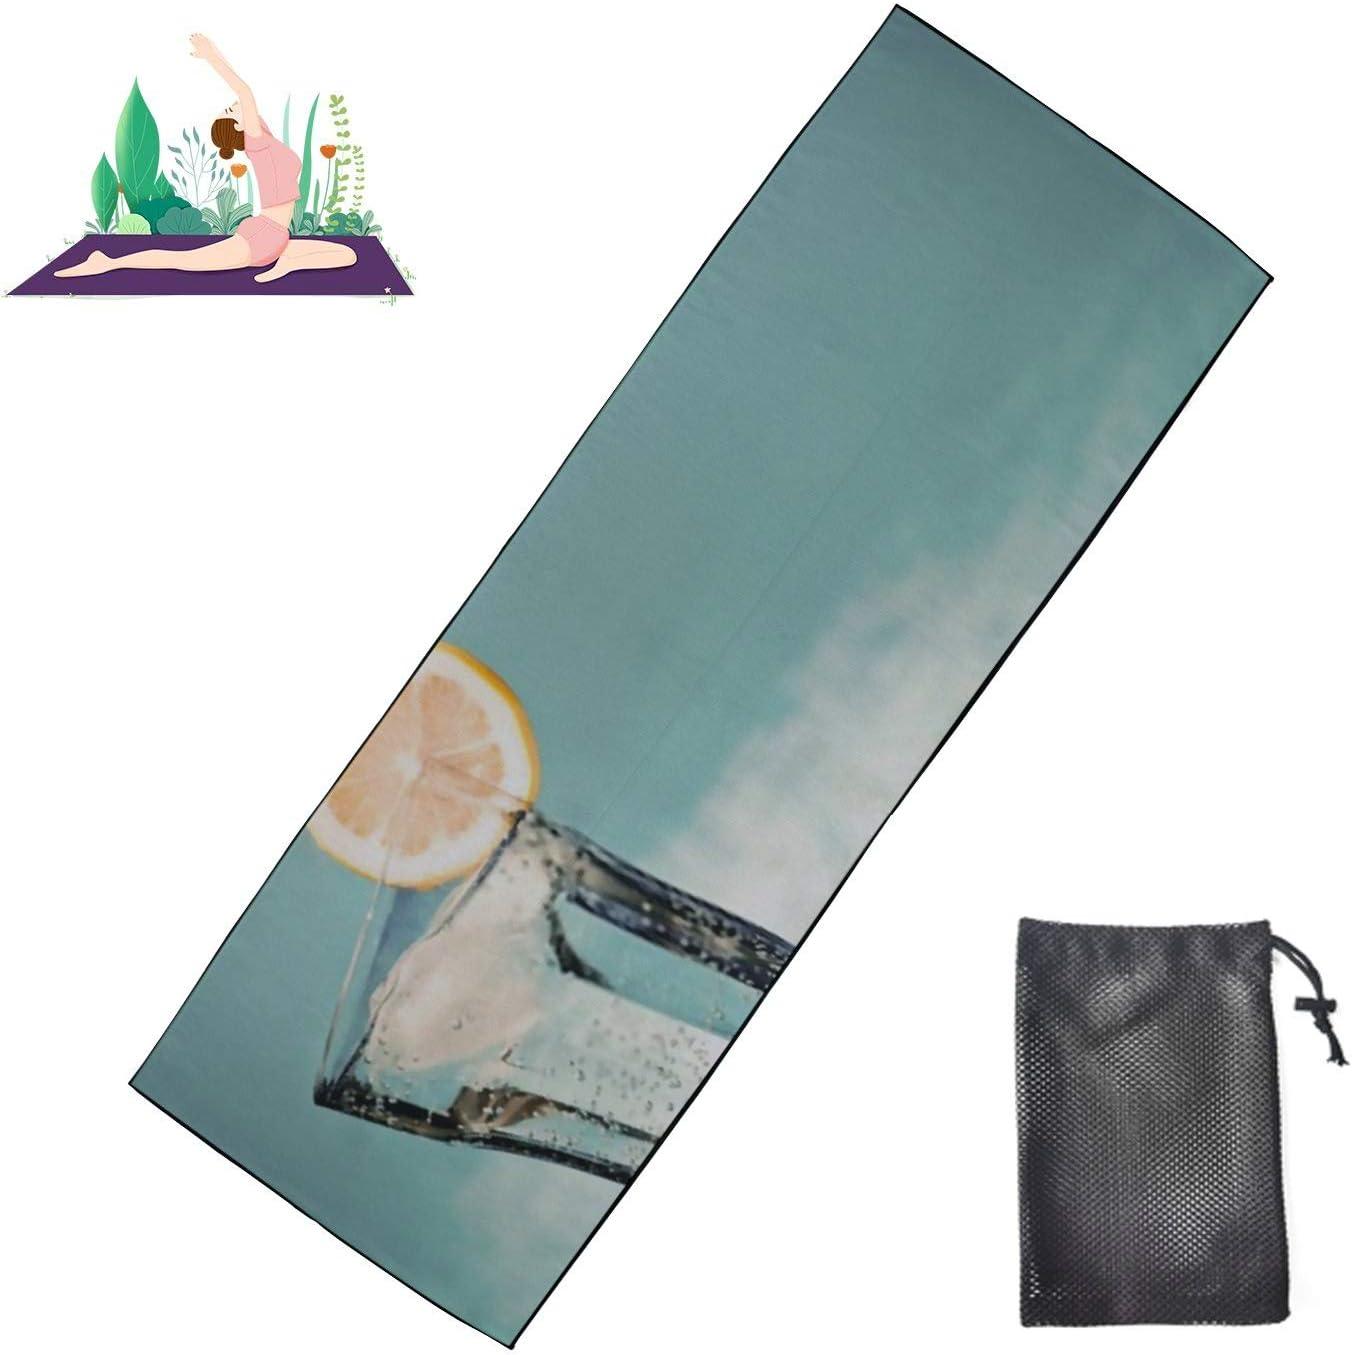 HJSHG Yoga Fashionable Mat Towel Cold Drink Hot On Nons Lemon Ice Slice Trust